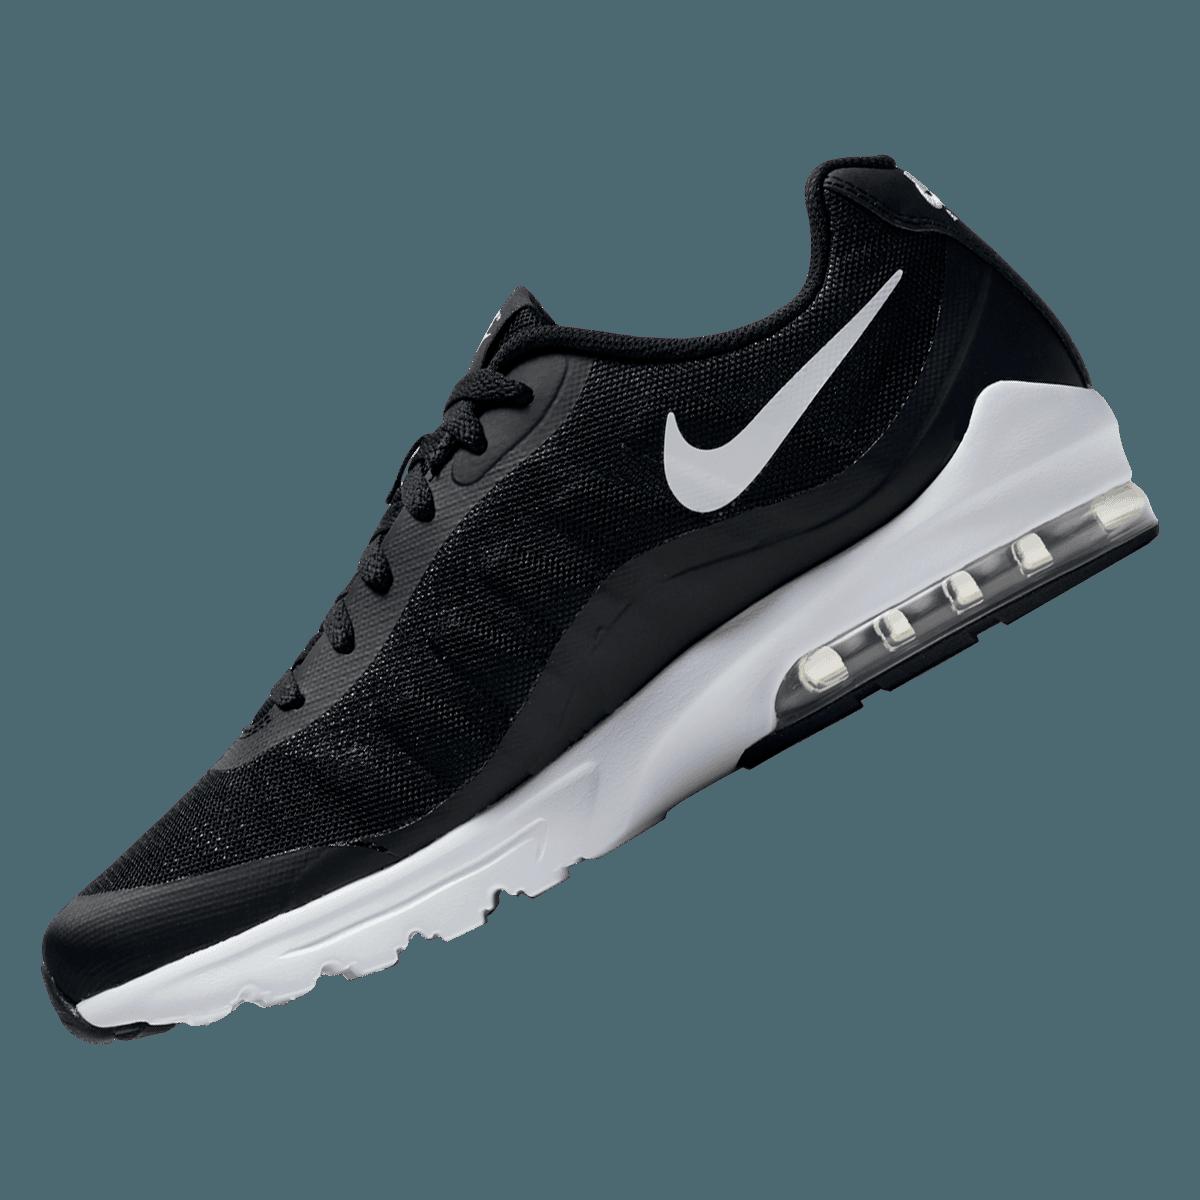 Nike hardloopschoenen Air Max Invigor zwartwit